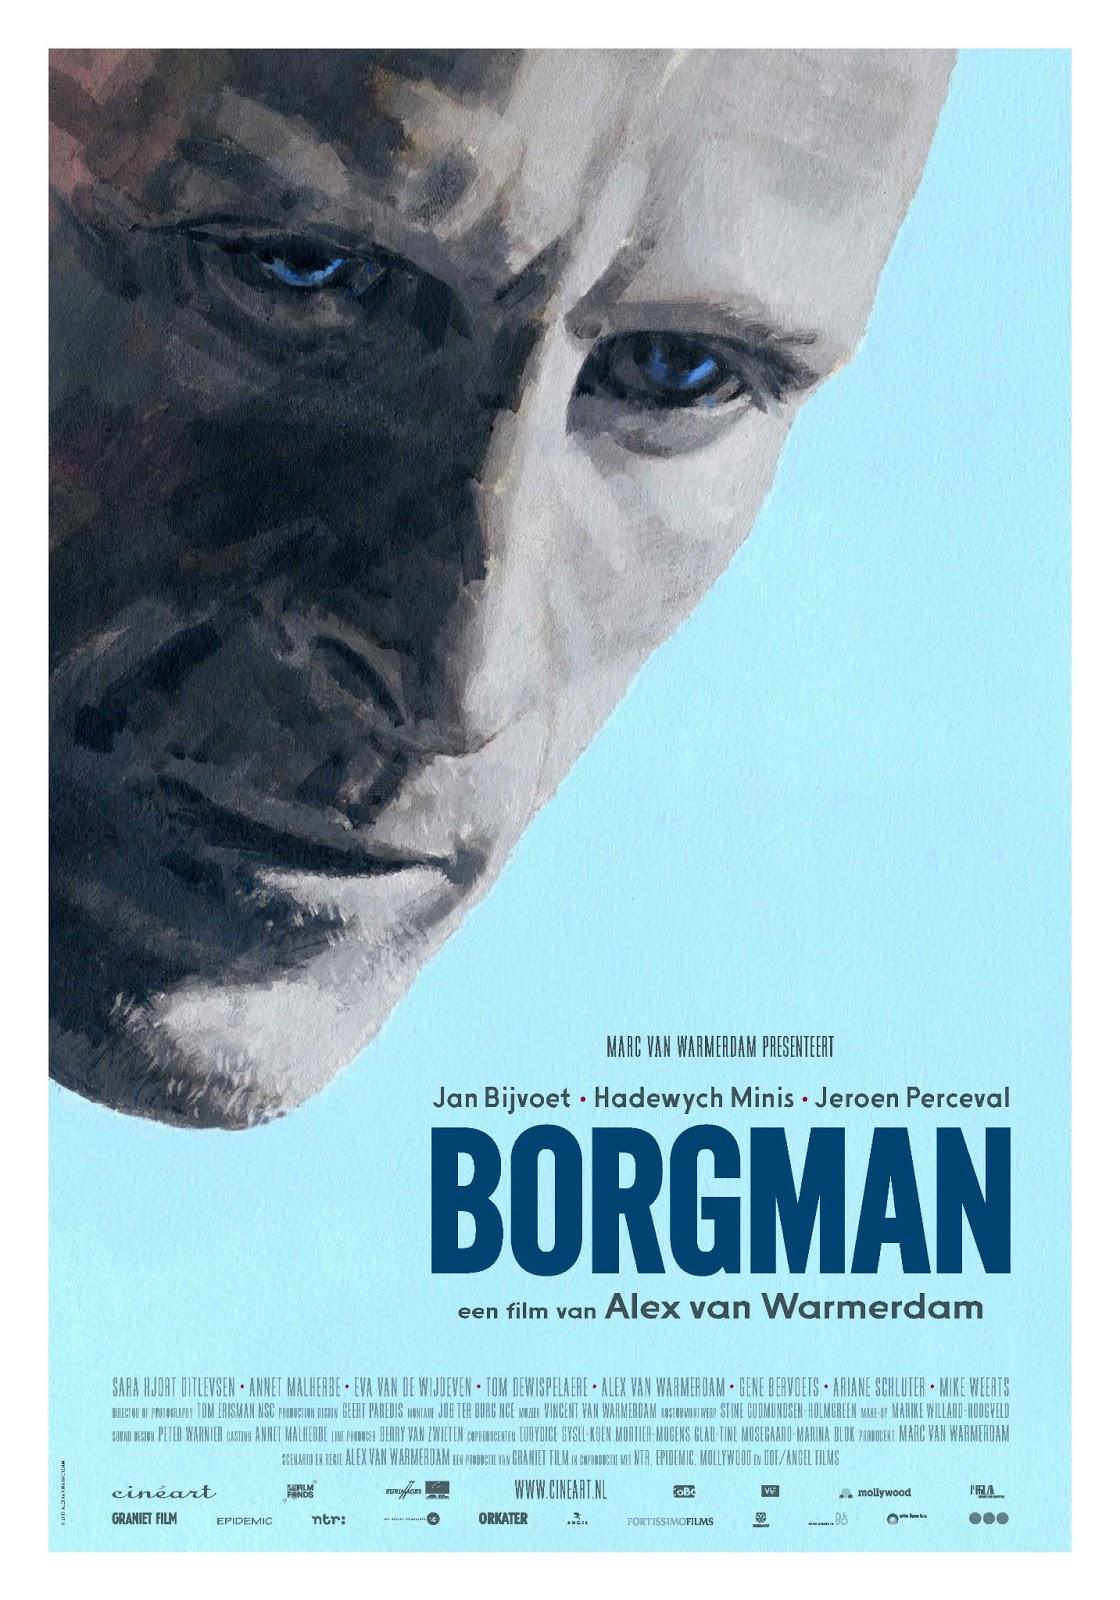 BORGMAN_poster.jpg